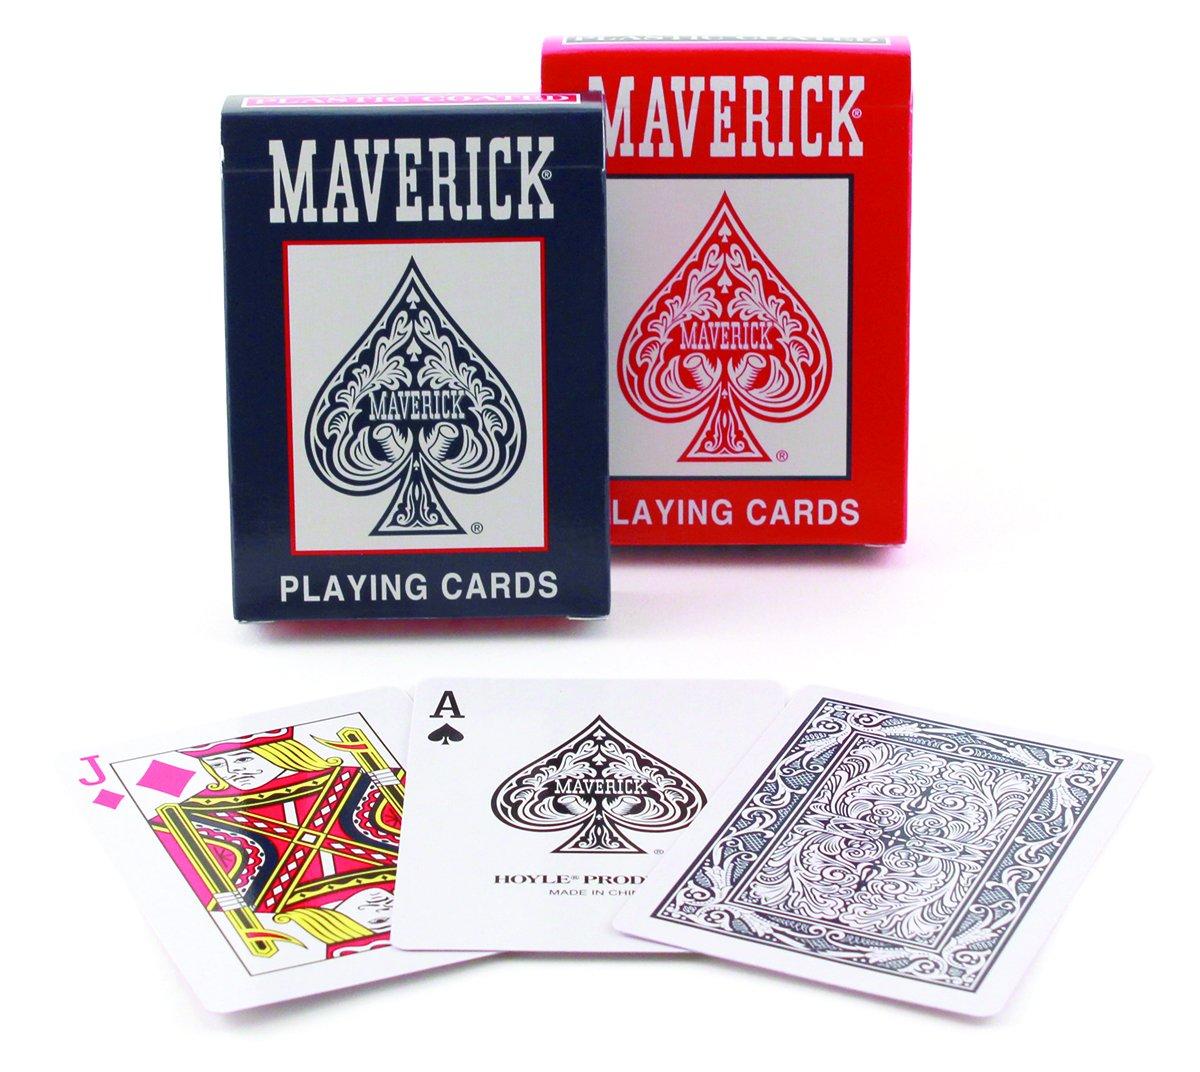 Maverick Standard Index Playing Cards, 1 CT $0.88 at Amazon